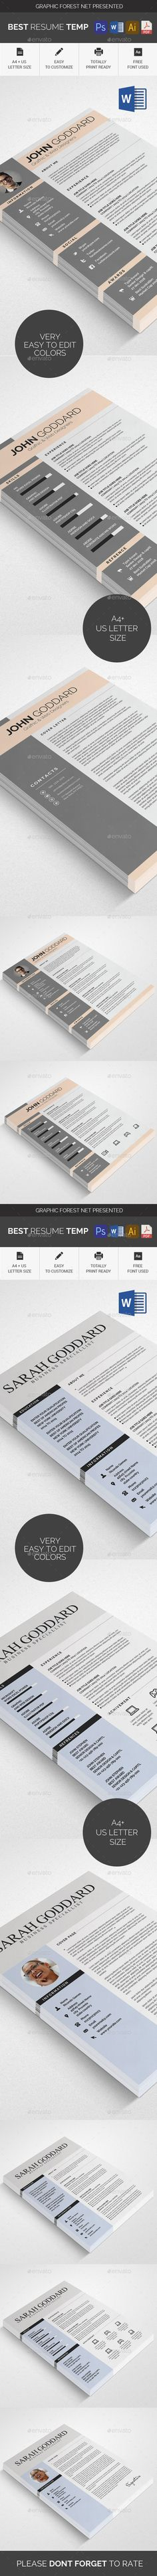 Resume Template Bundle - PSD, Vector EPS, AI Illustrator, MS Word